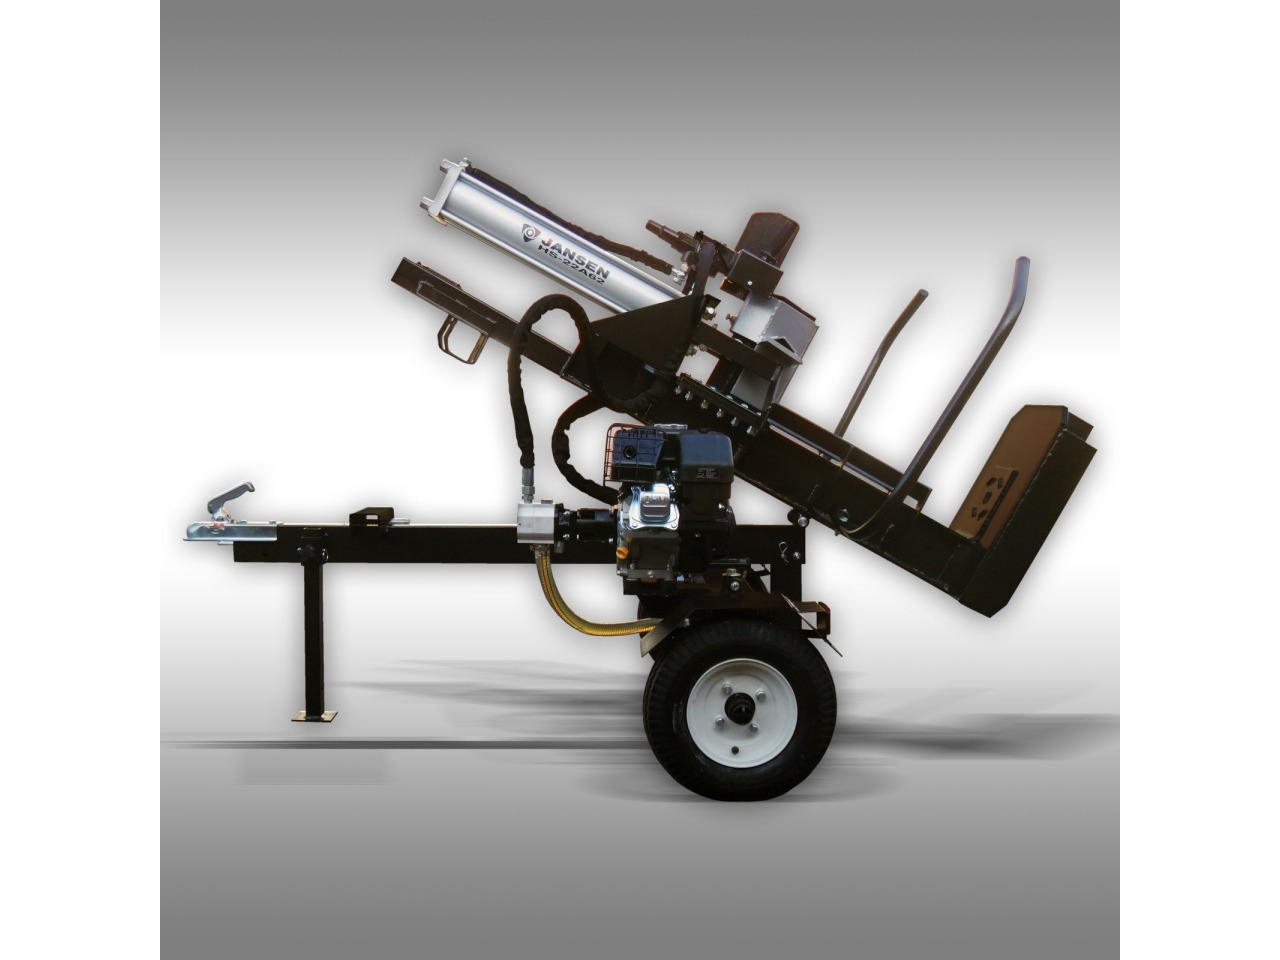 holzspalter jansen hs 22a62 holzspalter benzin atvshop. Black Bedroom Furniture Sets. Home Design Ideas